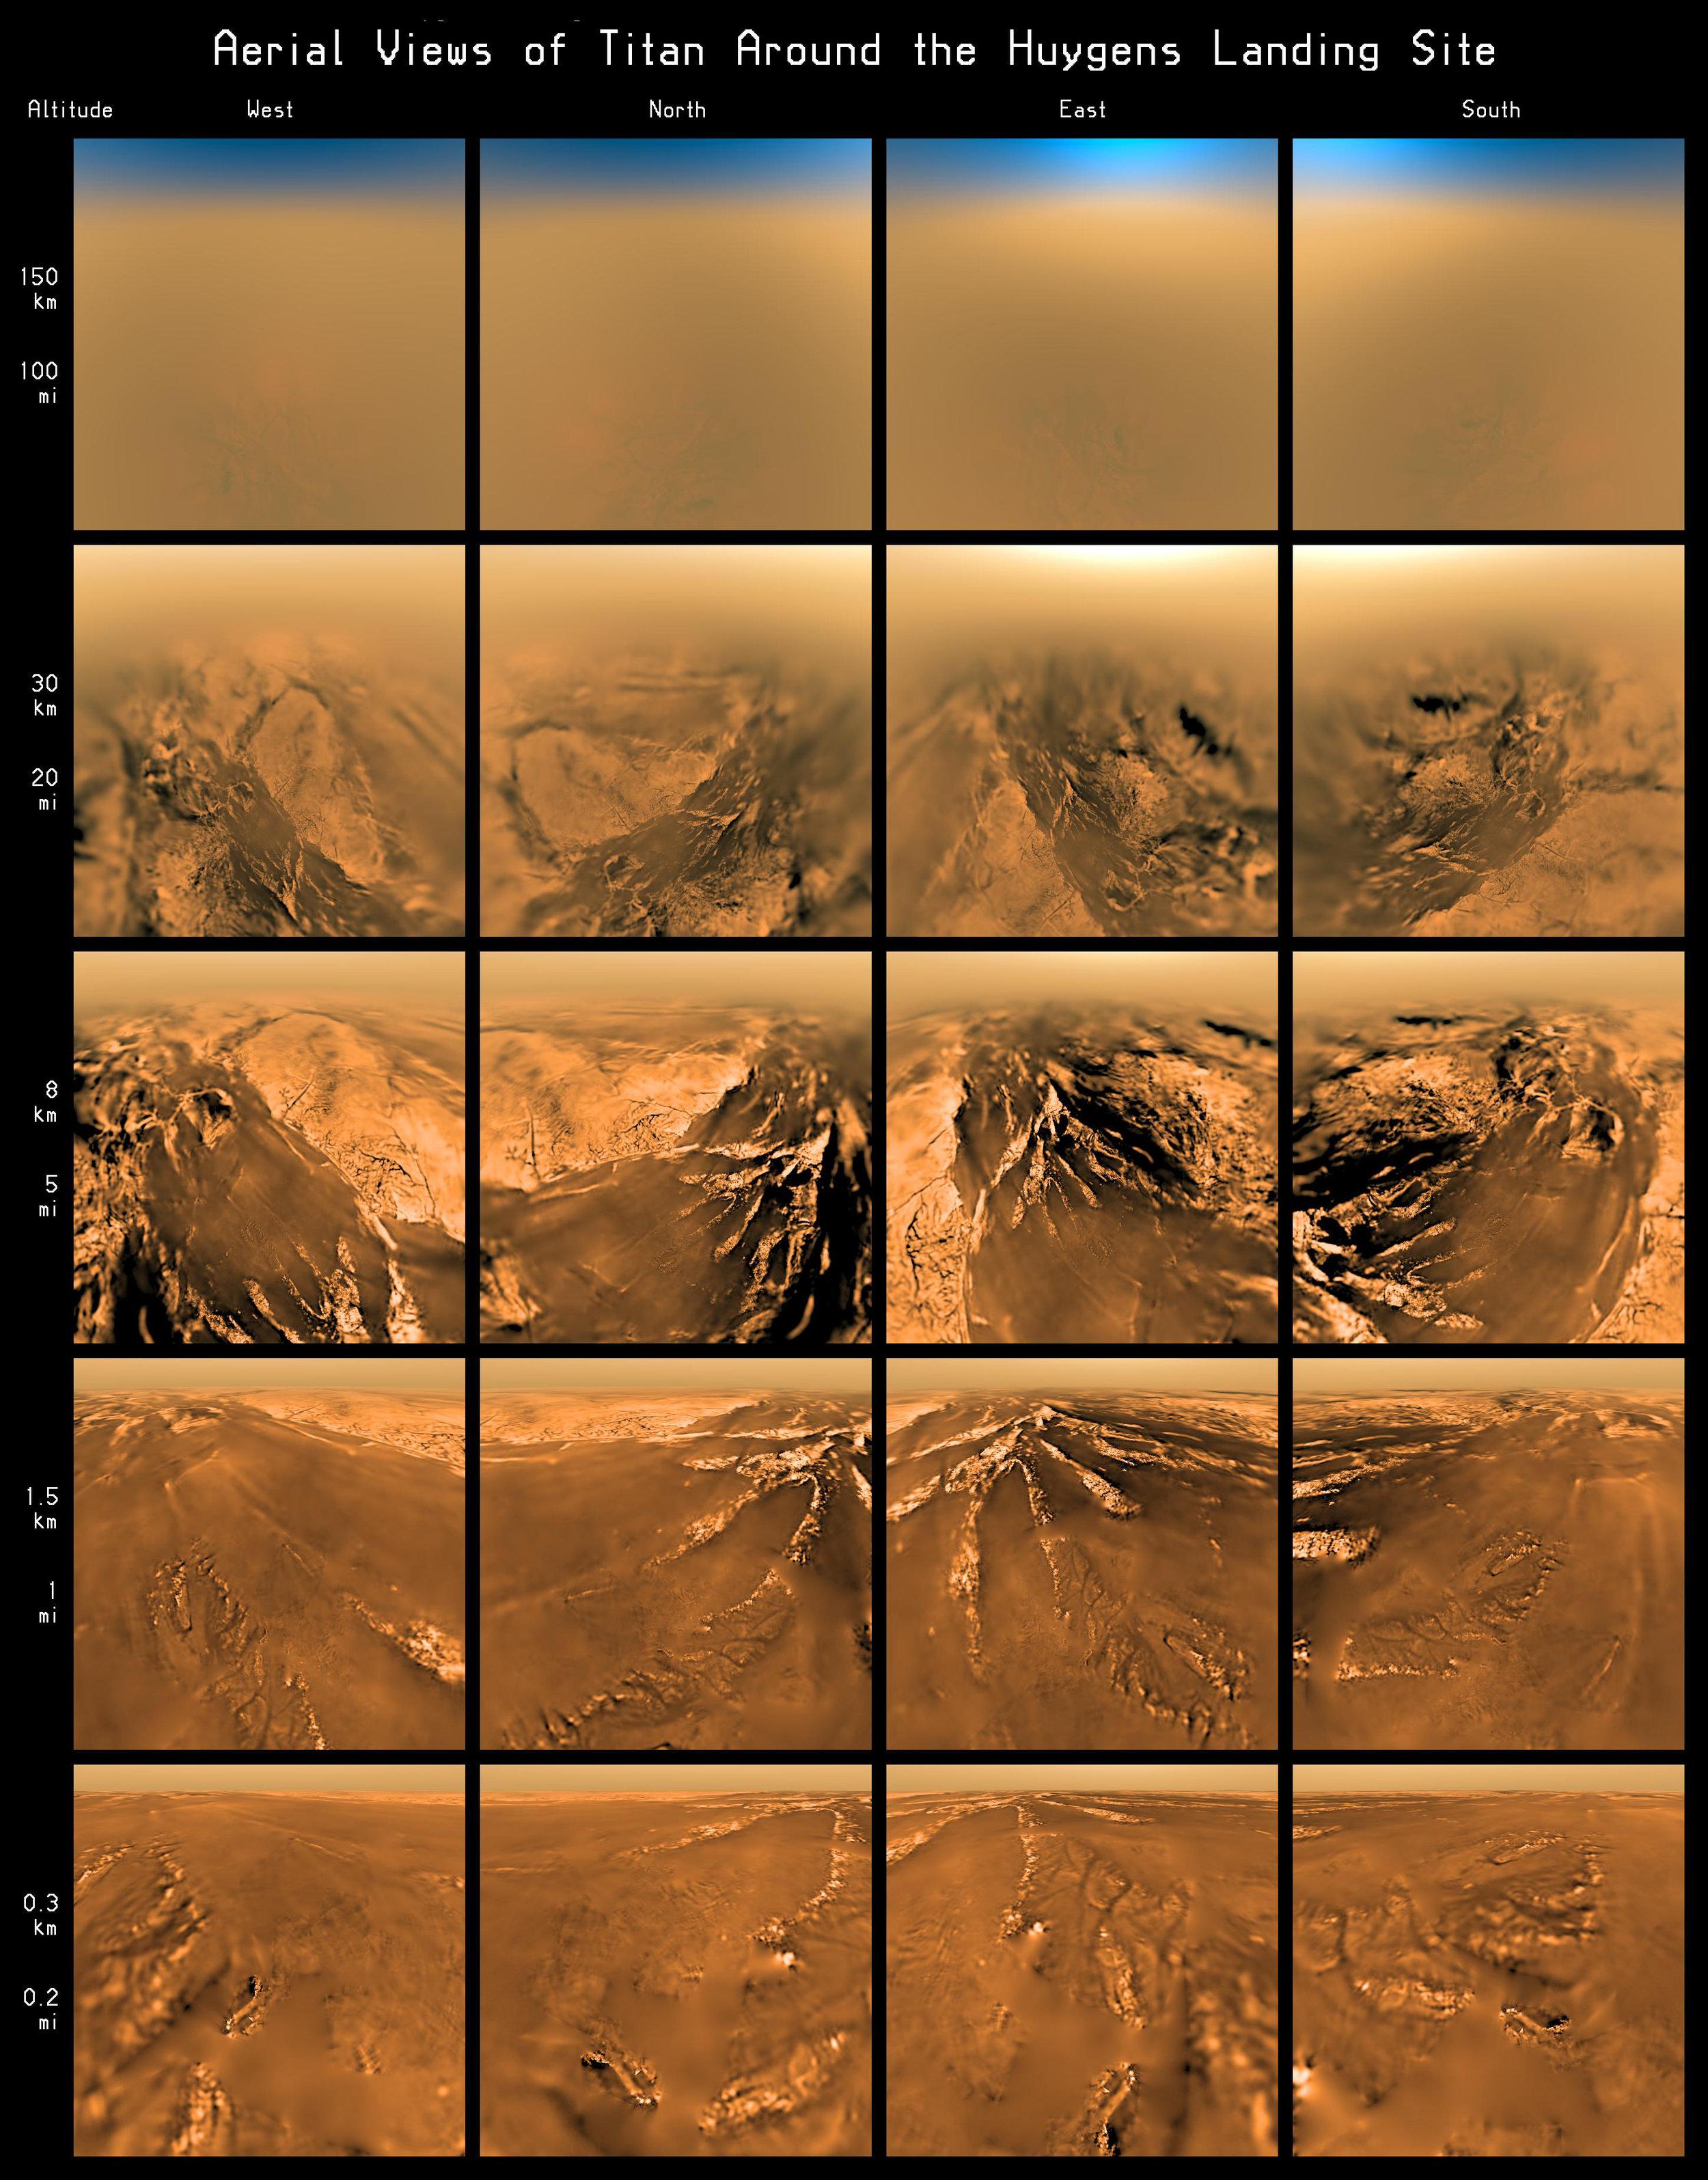 ESA/NASA/JPL/University of Arizona  Arial Views of Titan Around the Huygens Landing Site  (2015). Source:http://sci.esa.int/science-e-media/img/2b/Titan-DISR-5altitudes-composite.jpe